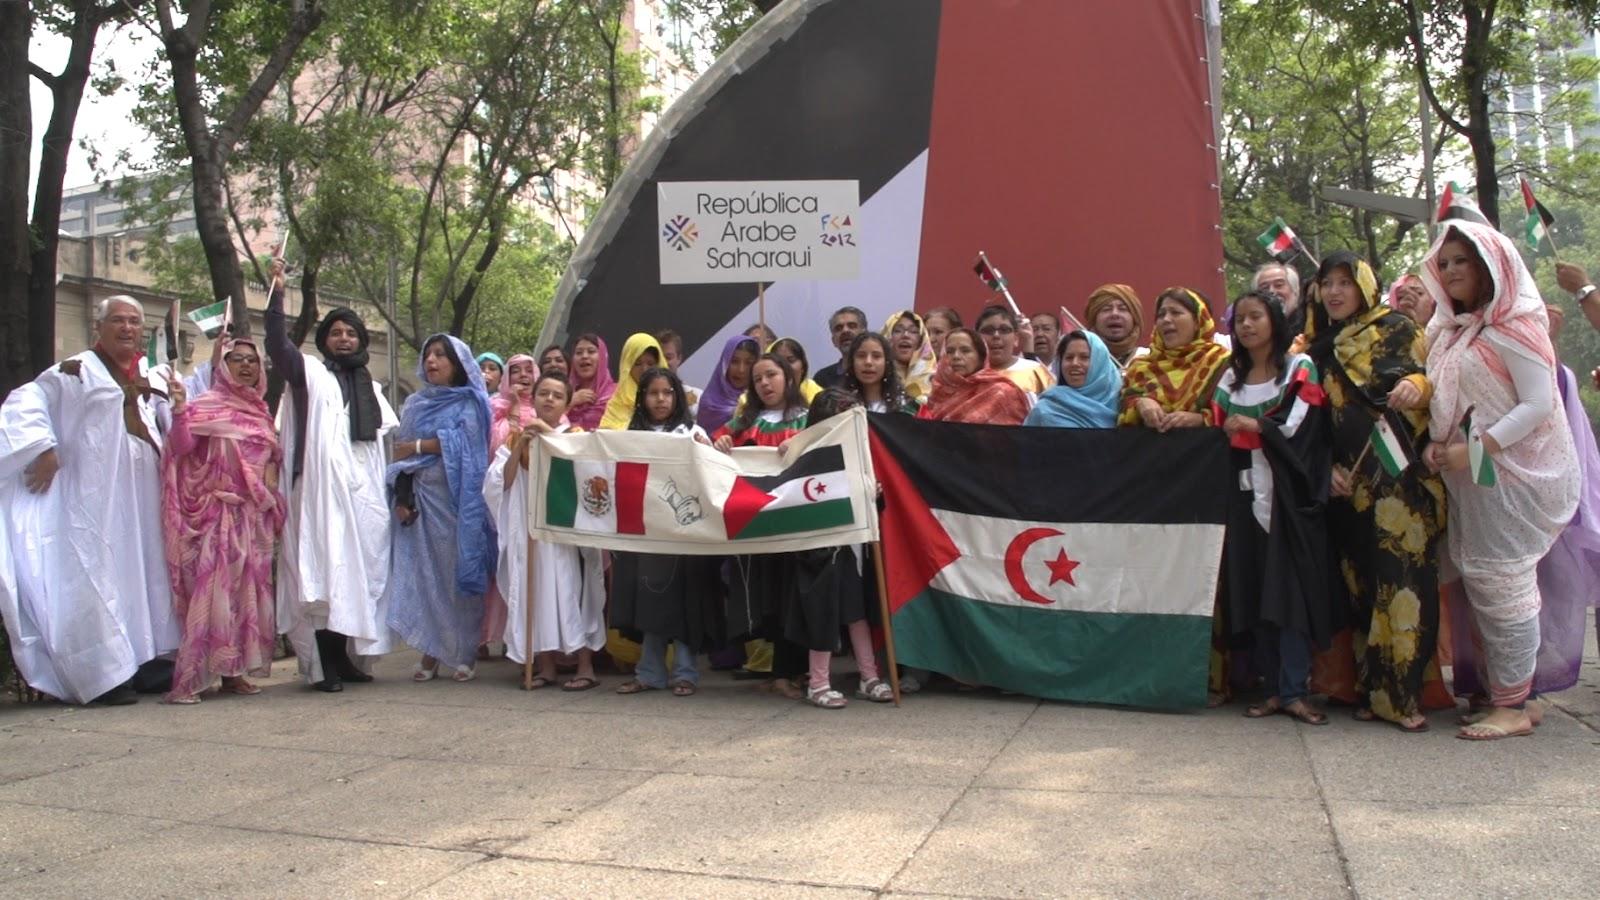 Resultado de imagen para Saharawi community mexico